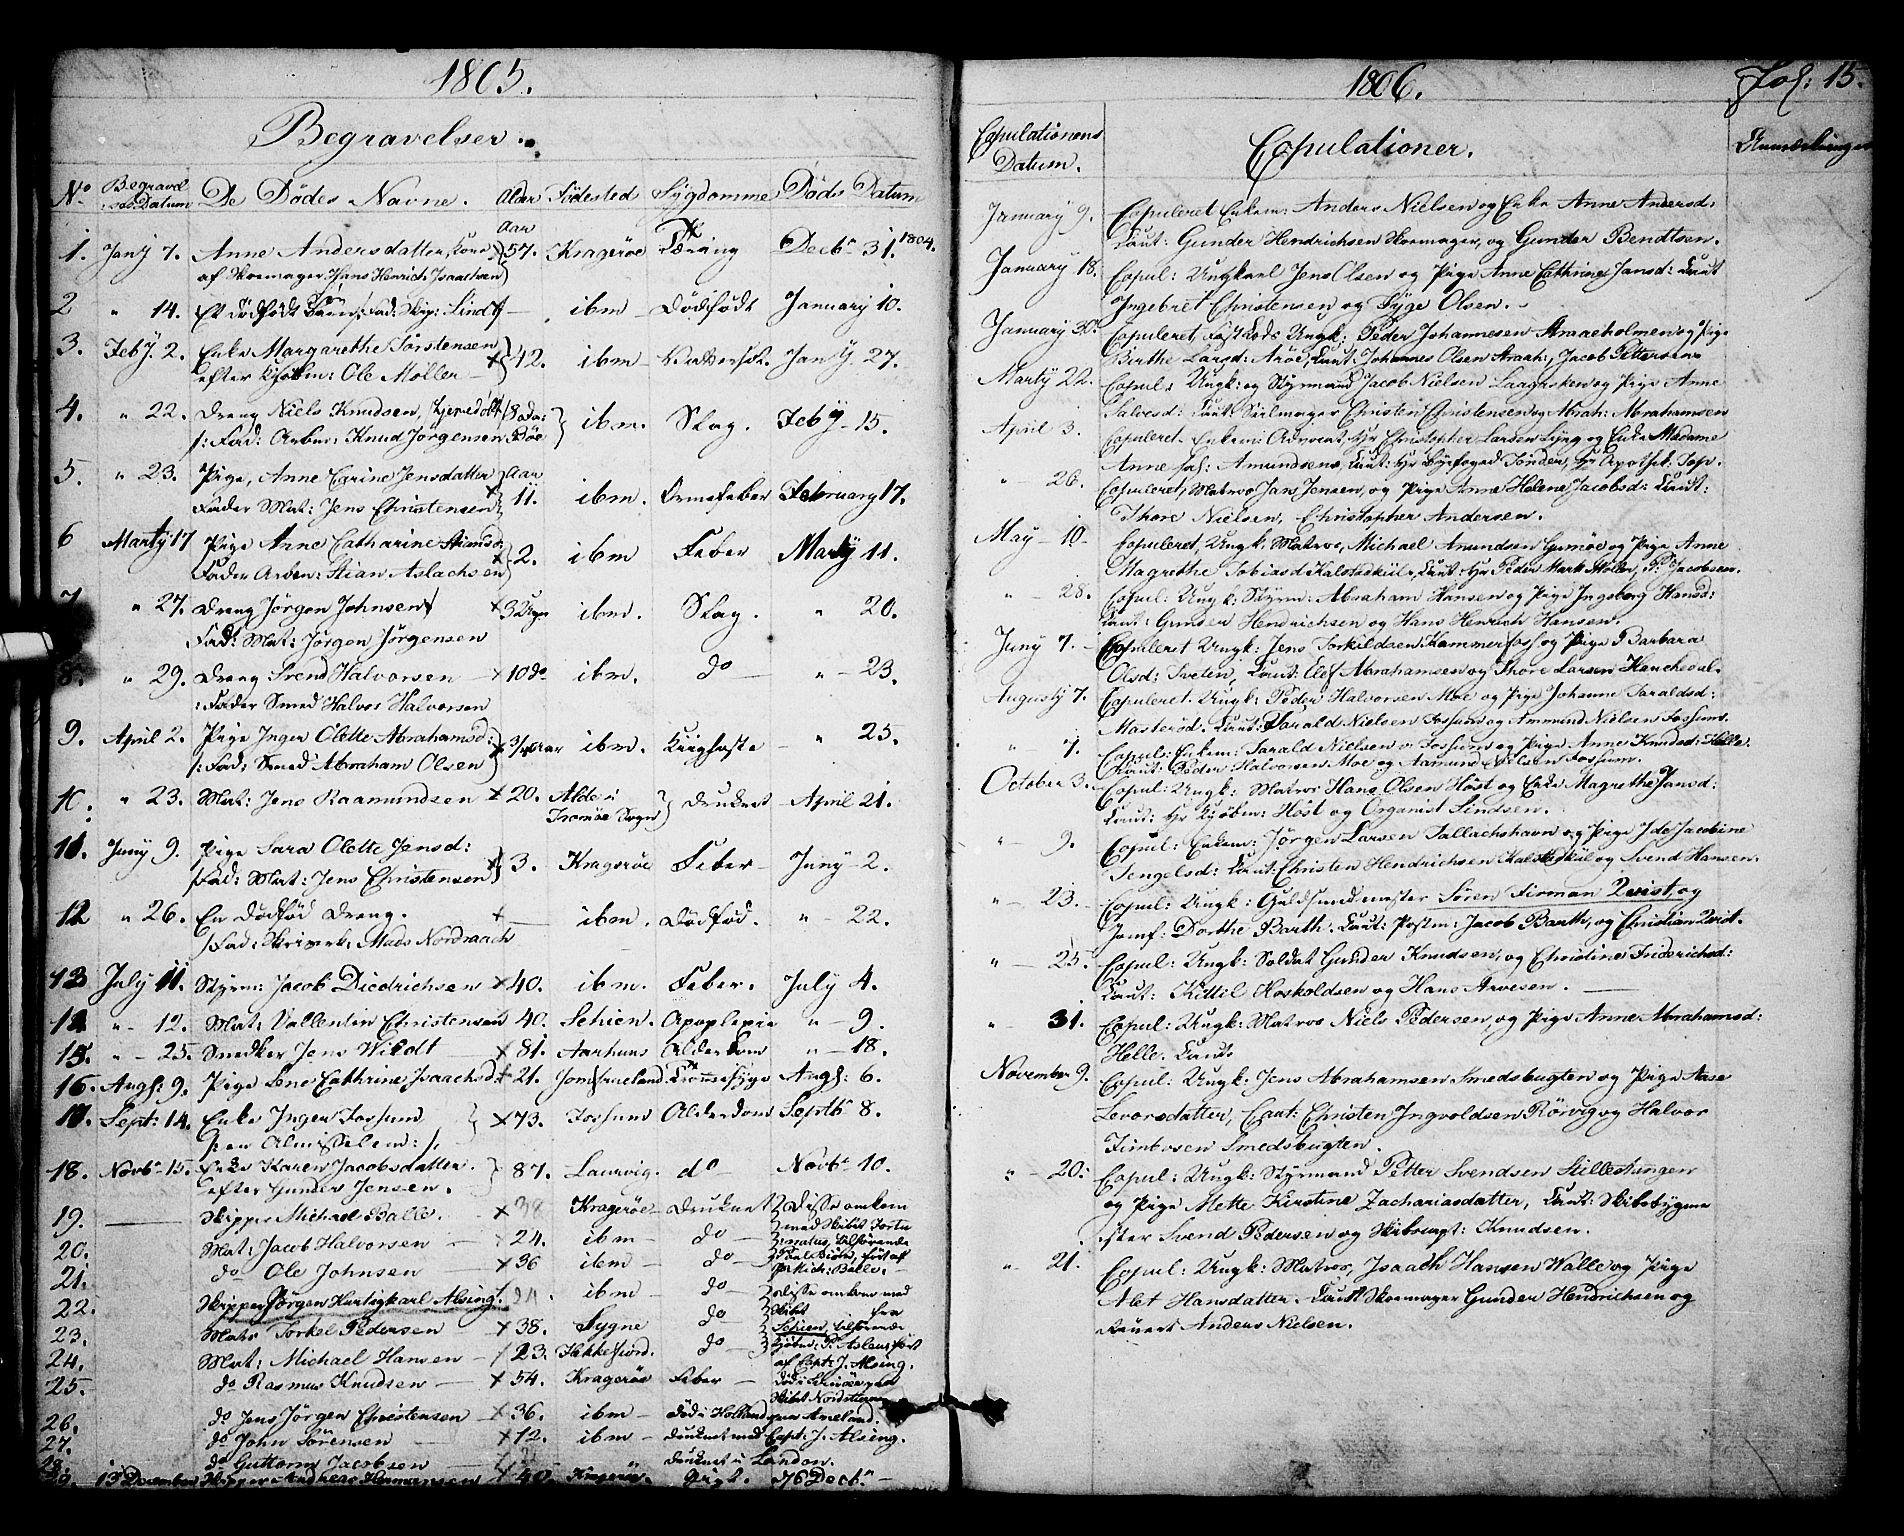 SAKO, Kragerø kirkebøker, F/Fa/L0003: Ministerialbok nr. 3, 1802-1813, s. 15